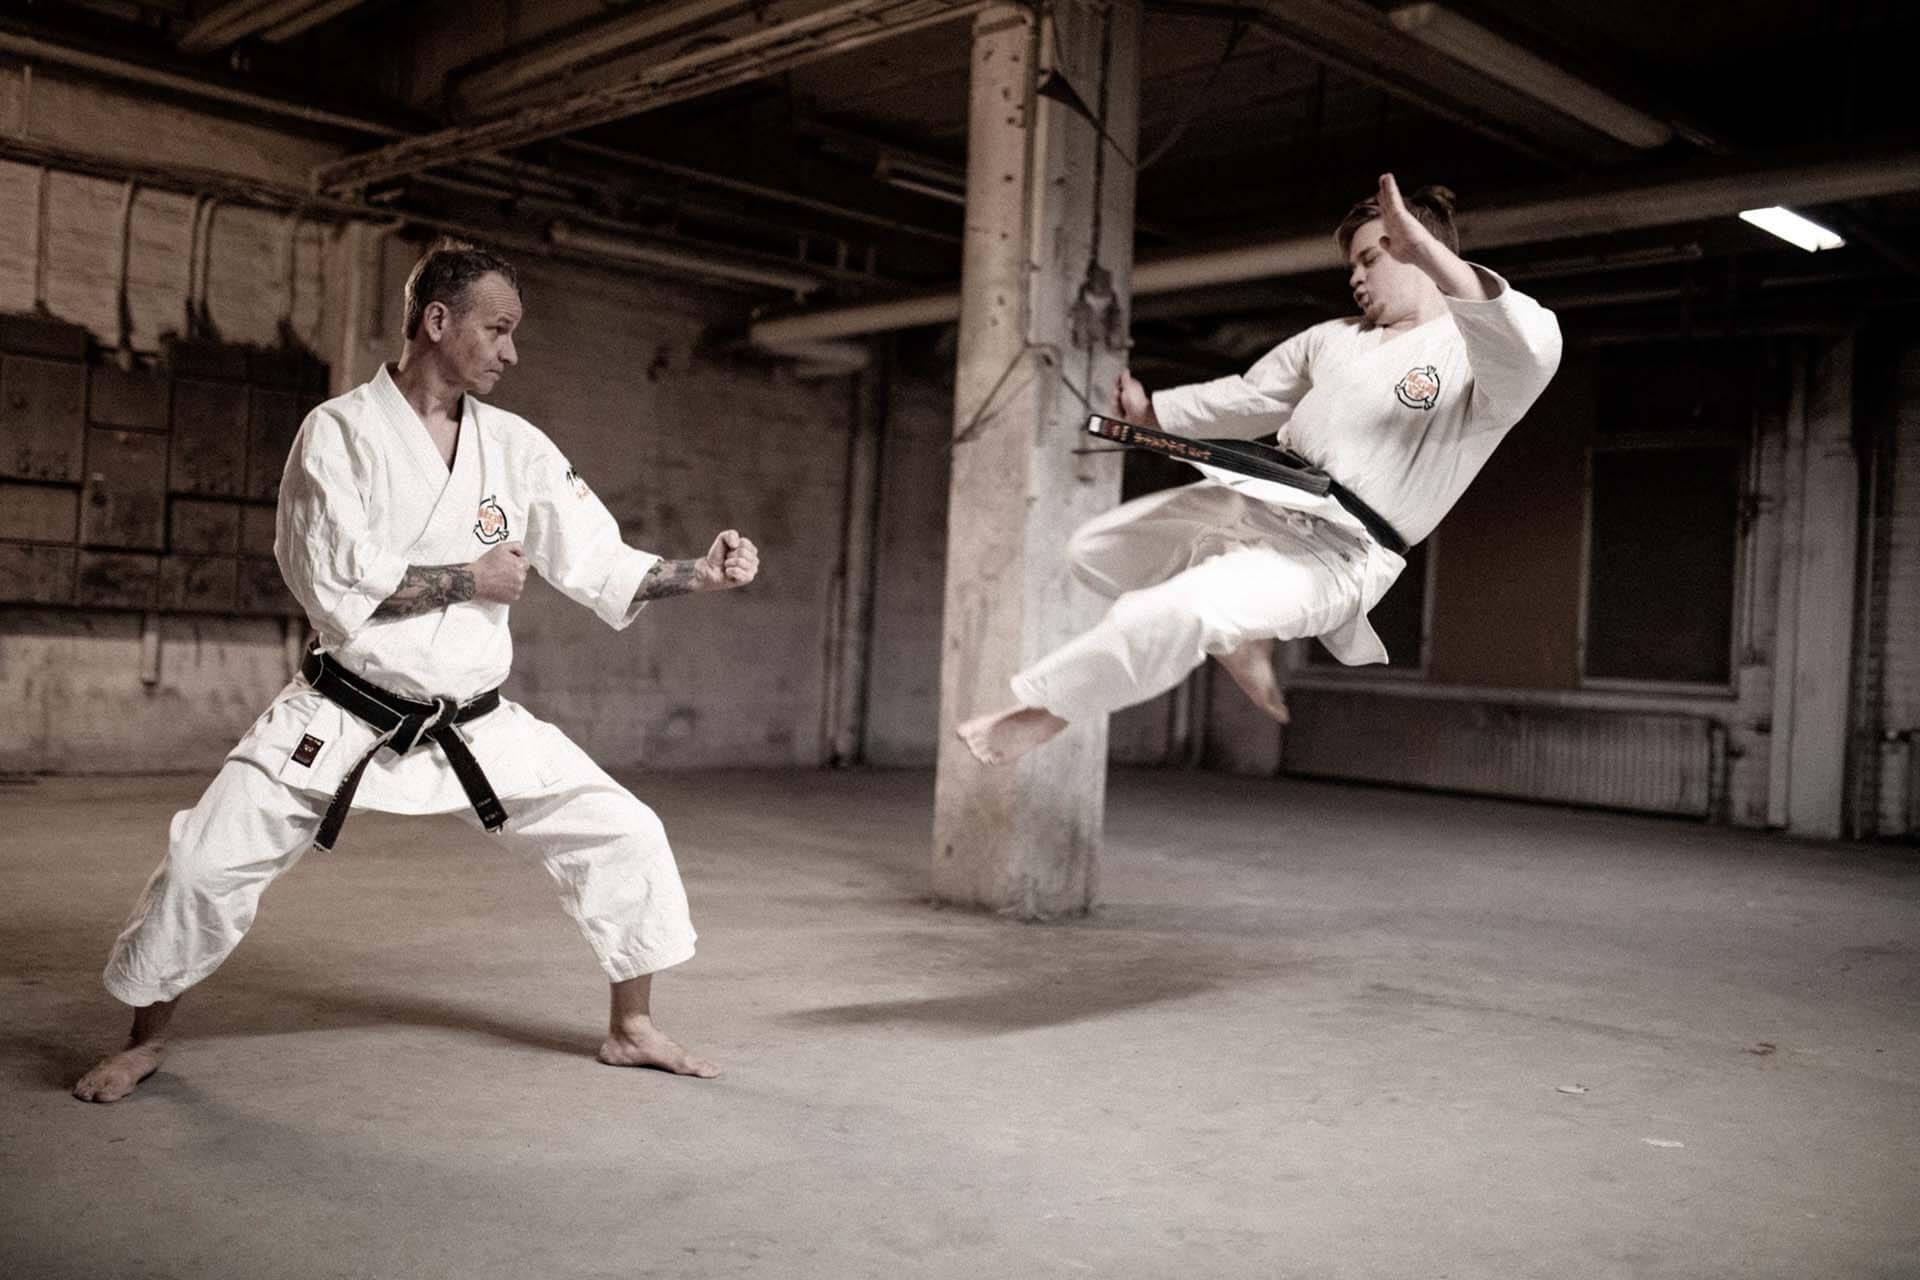 Jigotai Karate